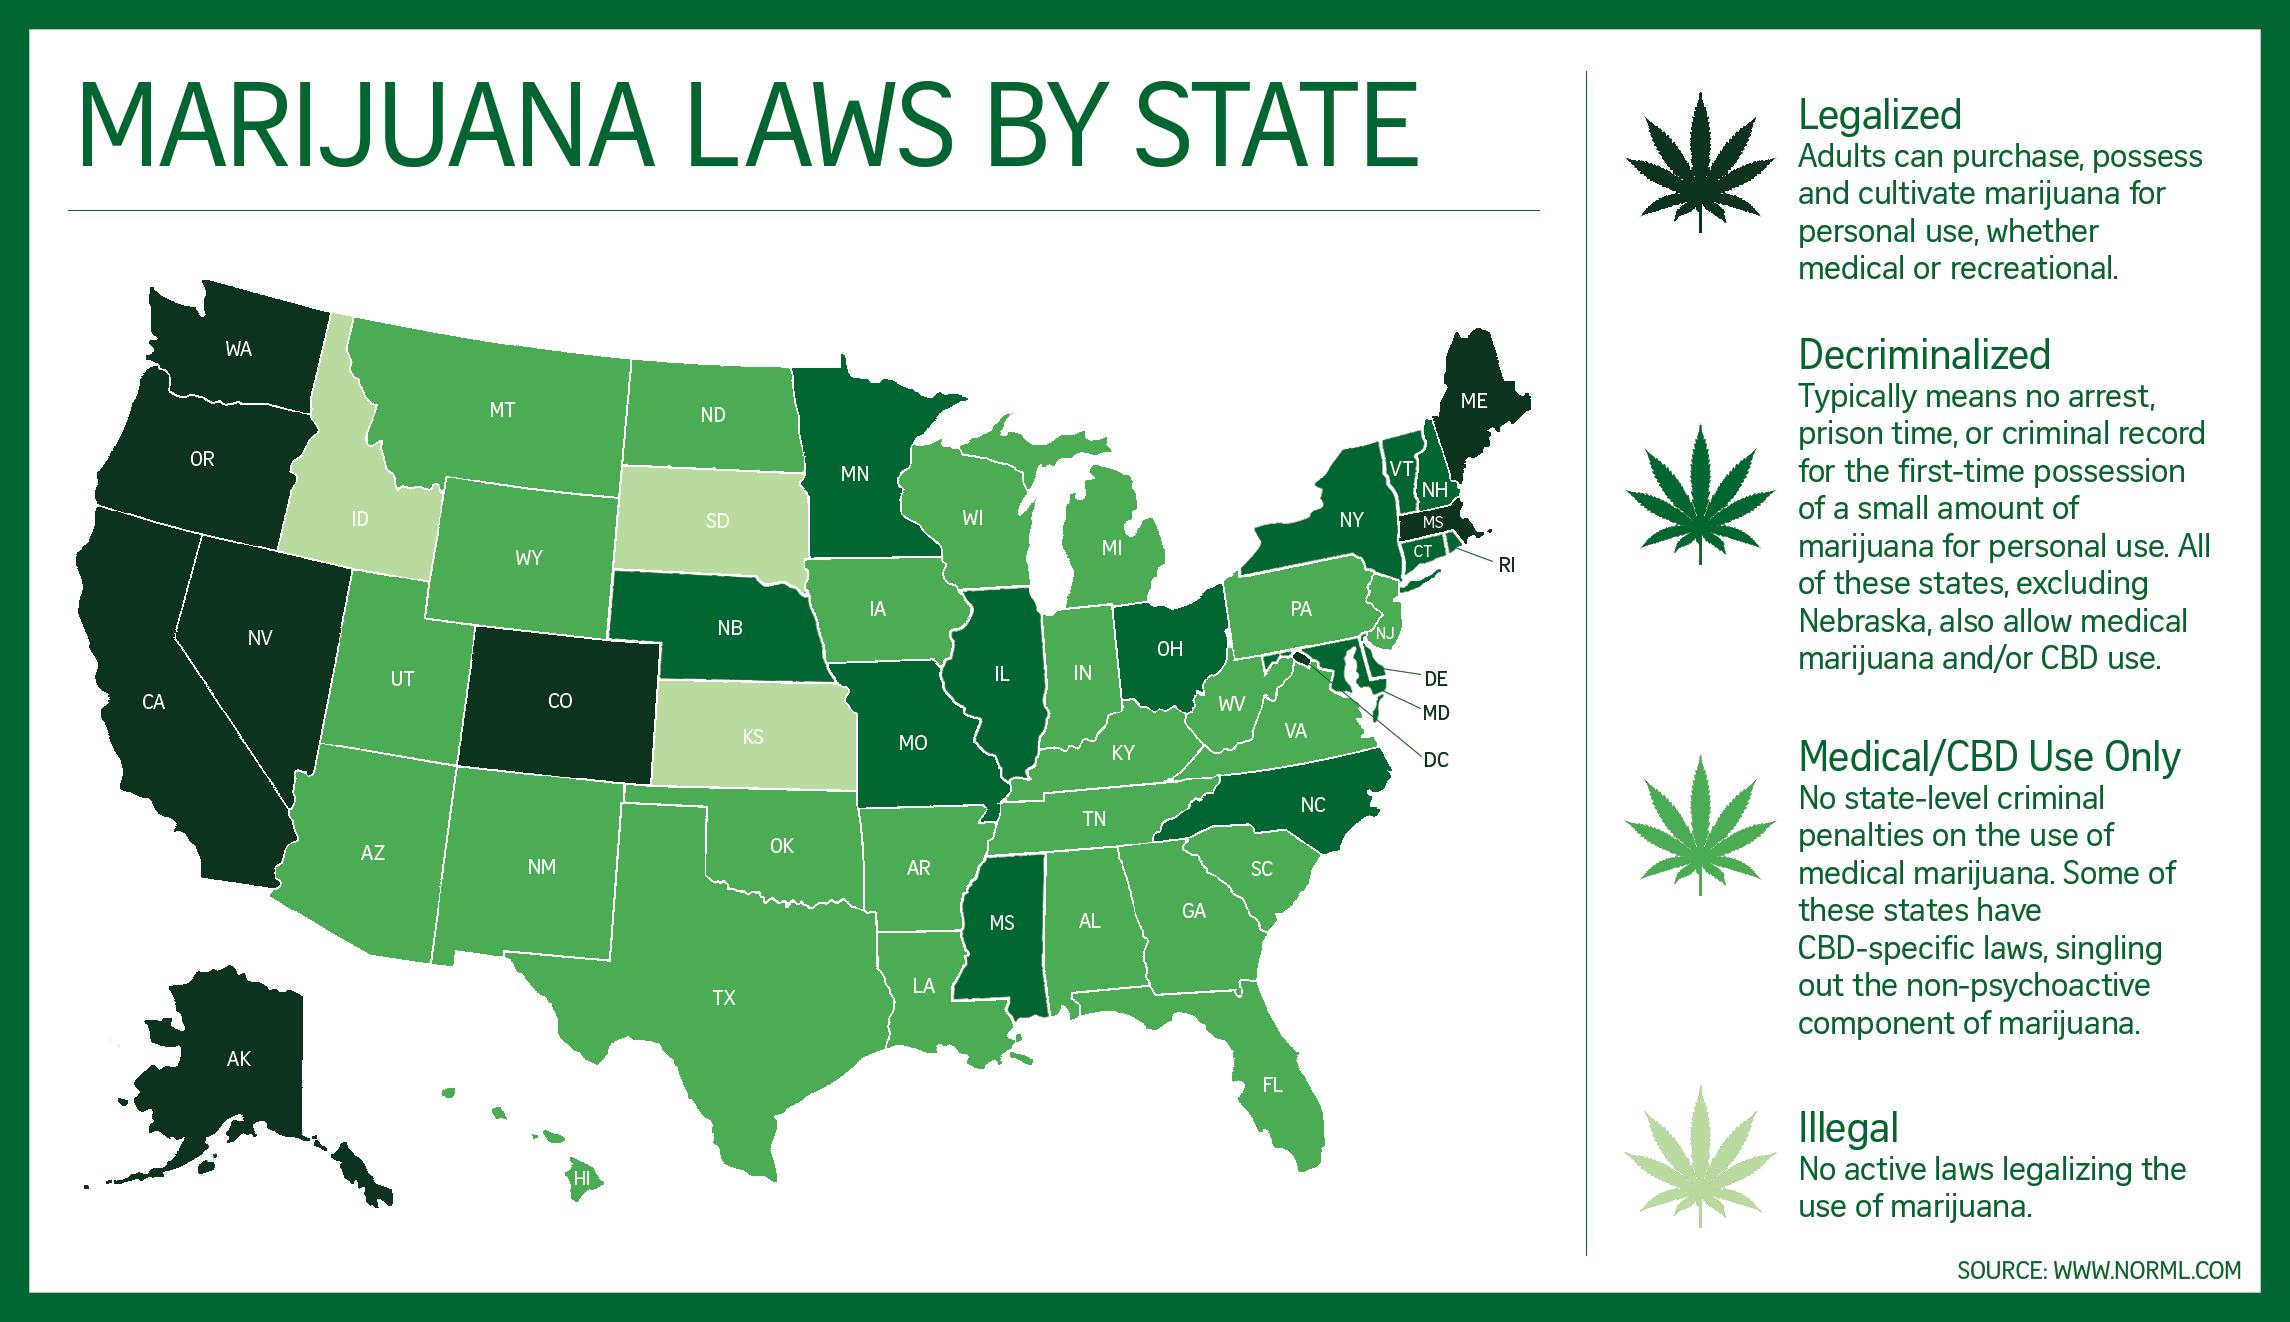 Live updates: Calif., Mass. voters approve recreational marijuana